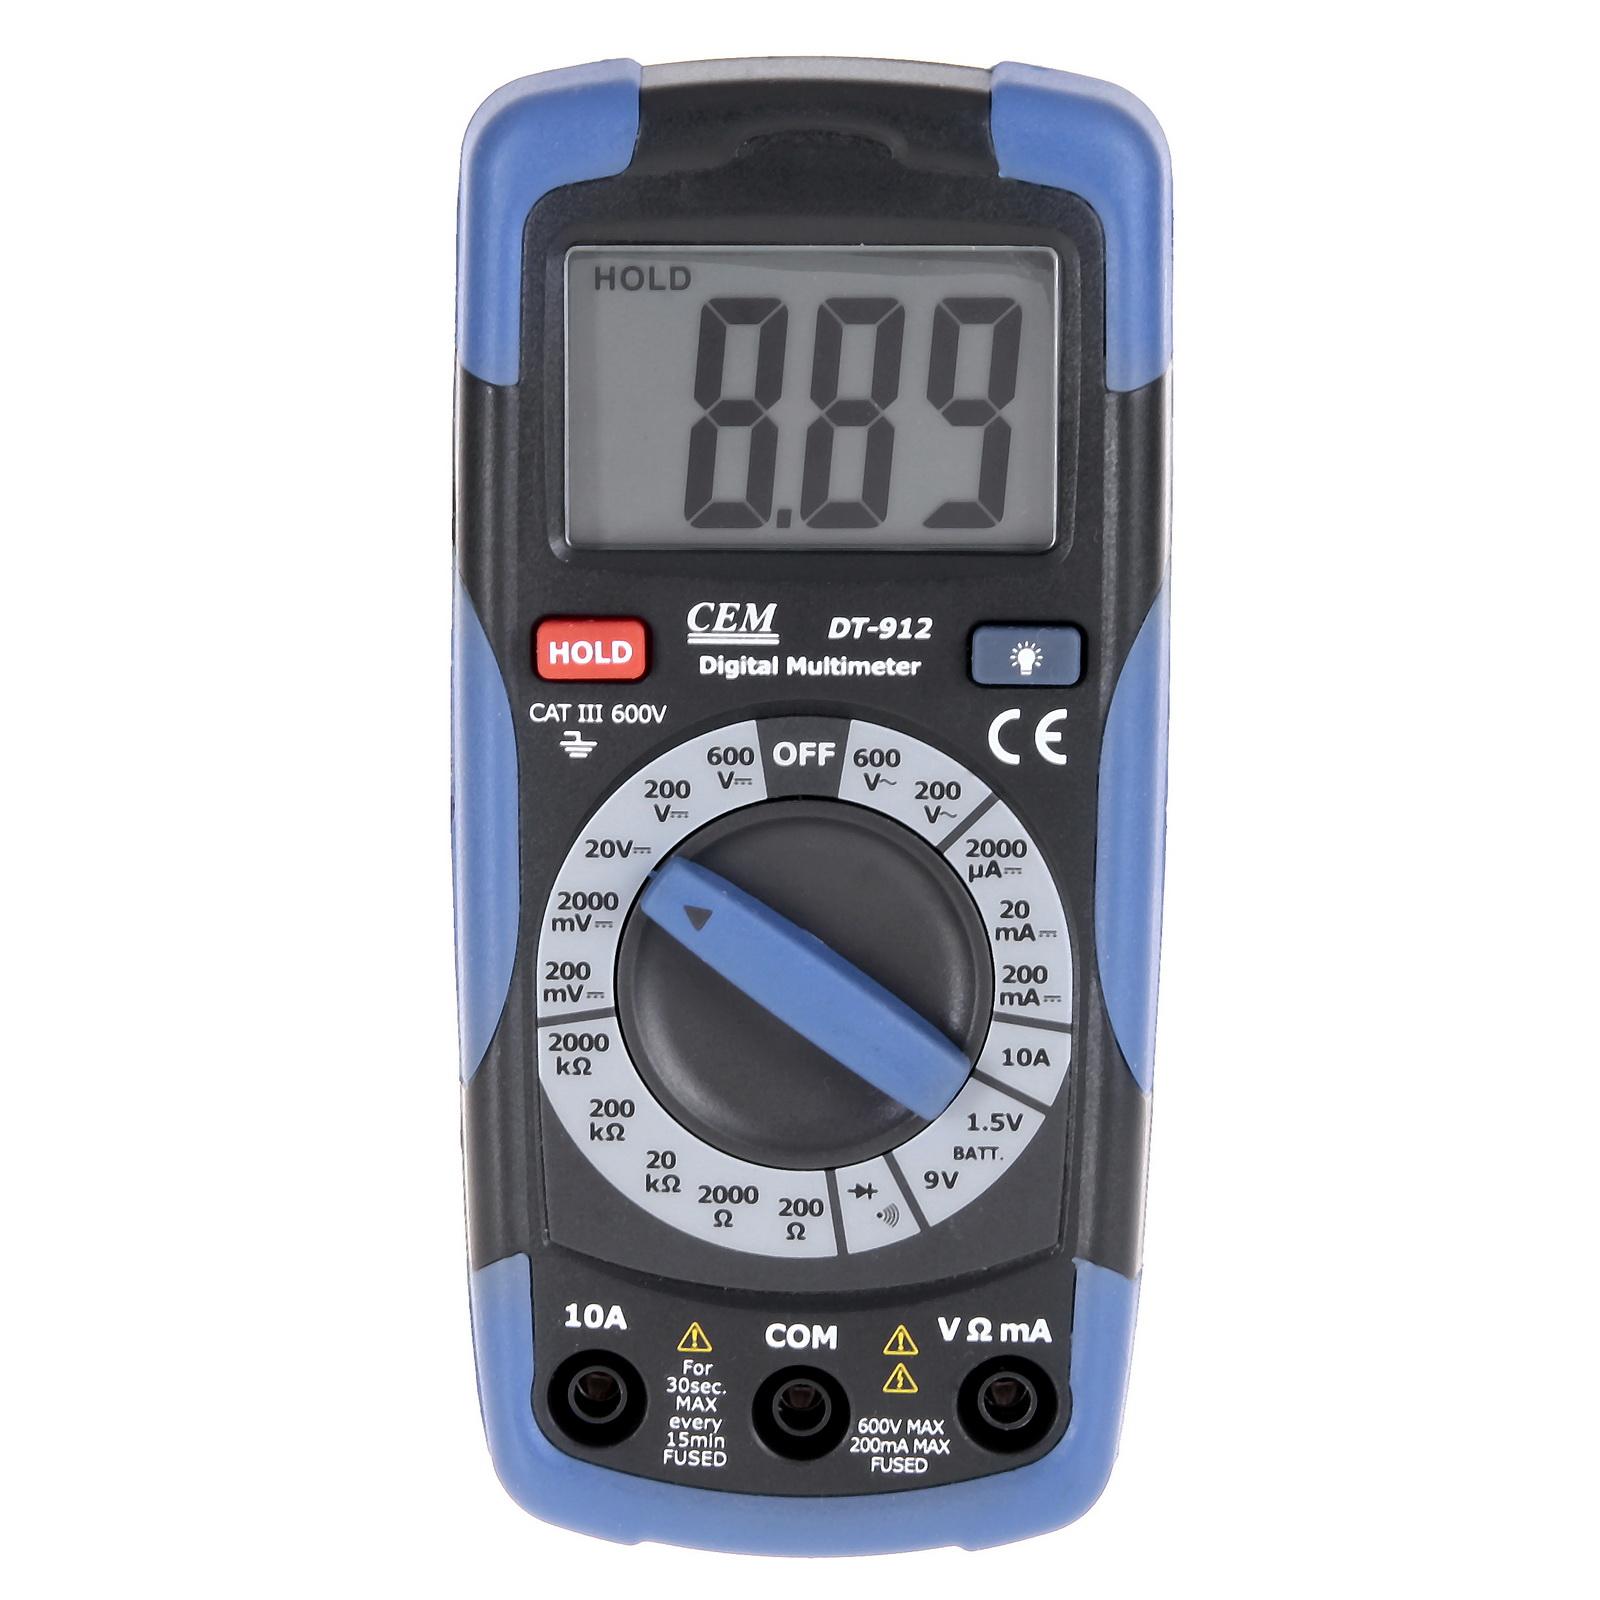 Мультиметр цифровой Cem Dt-912 цифровой